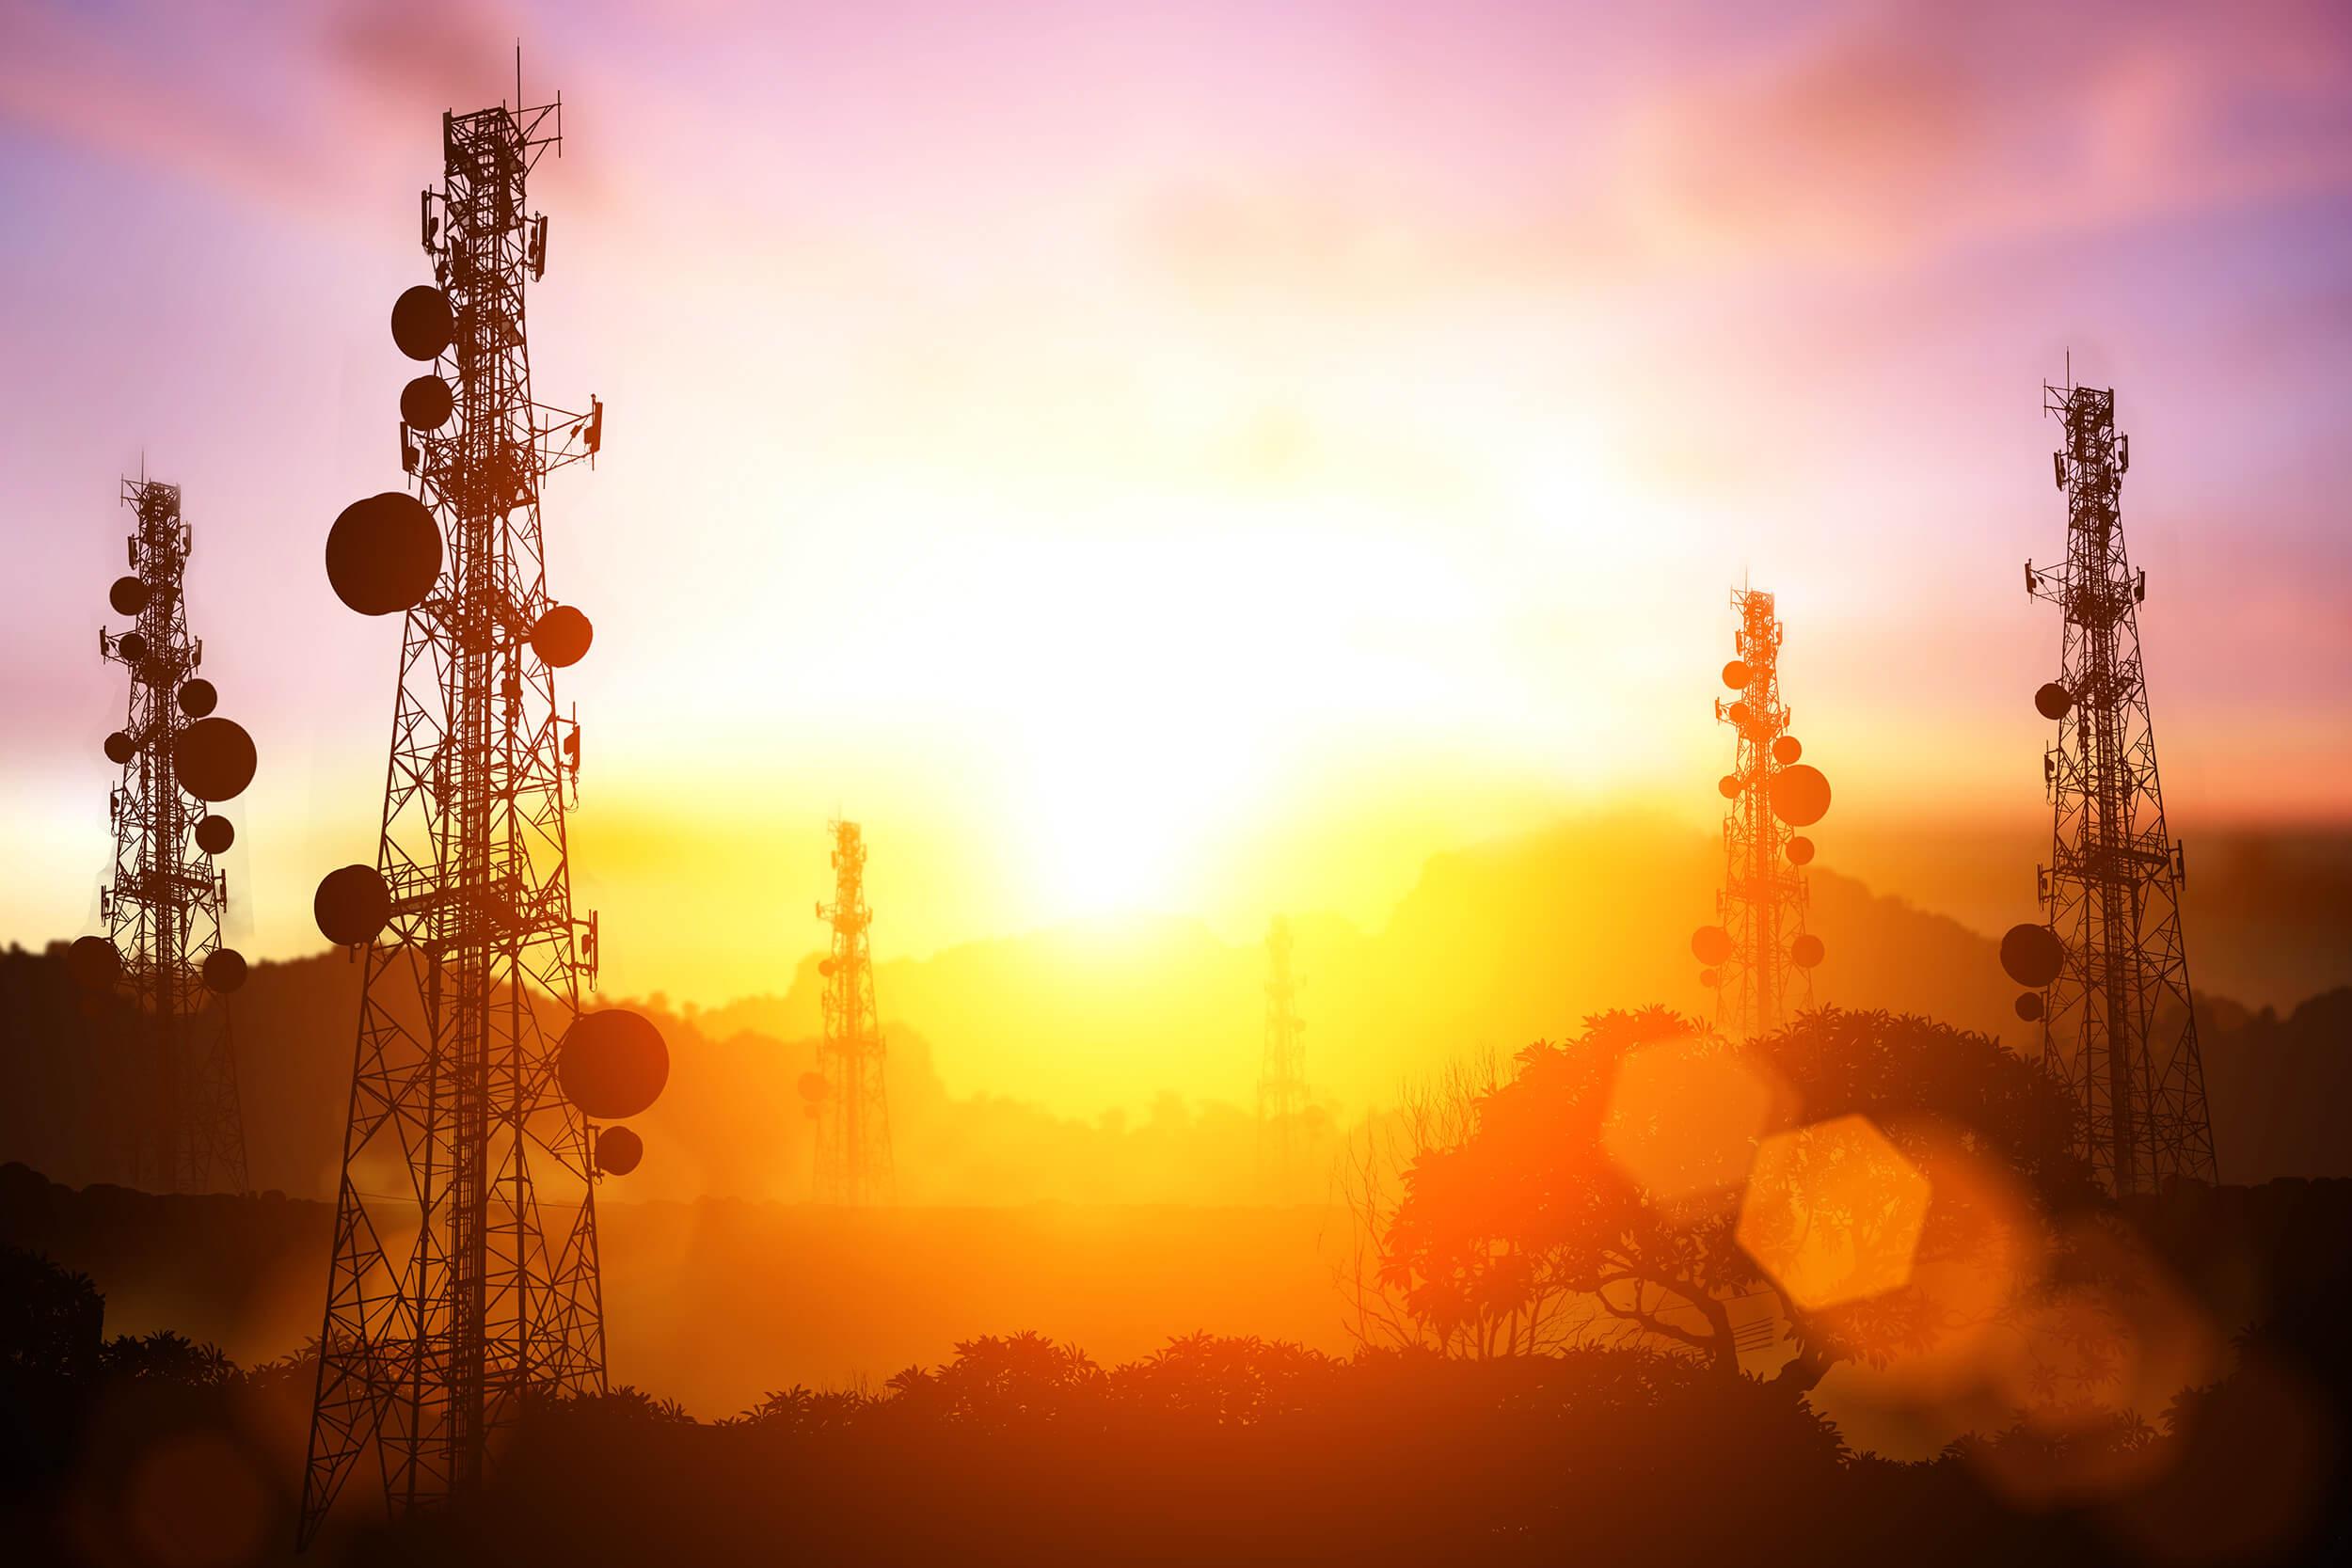 Telecom Obstruction lights